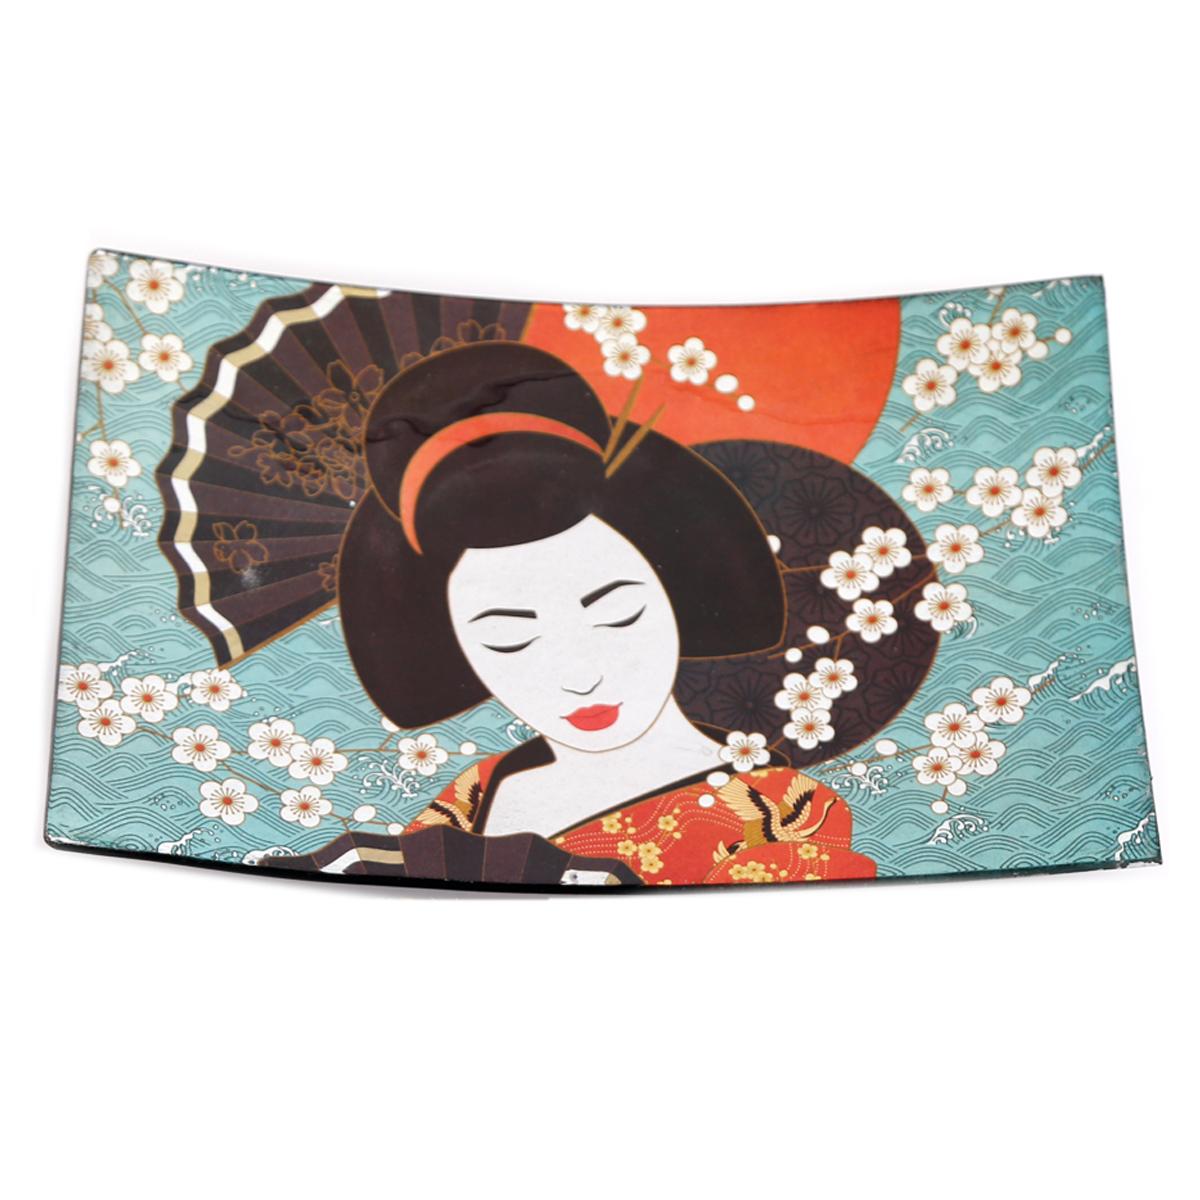 Coupelle vide poches verre \'Geisha\' turquoise - 23x15x3 cm - [A2907]